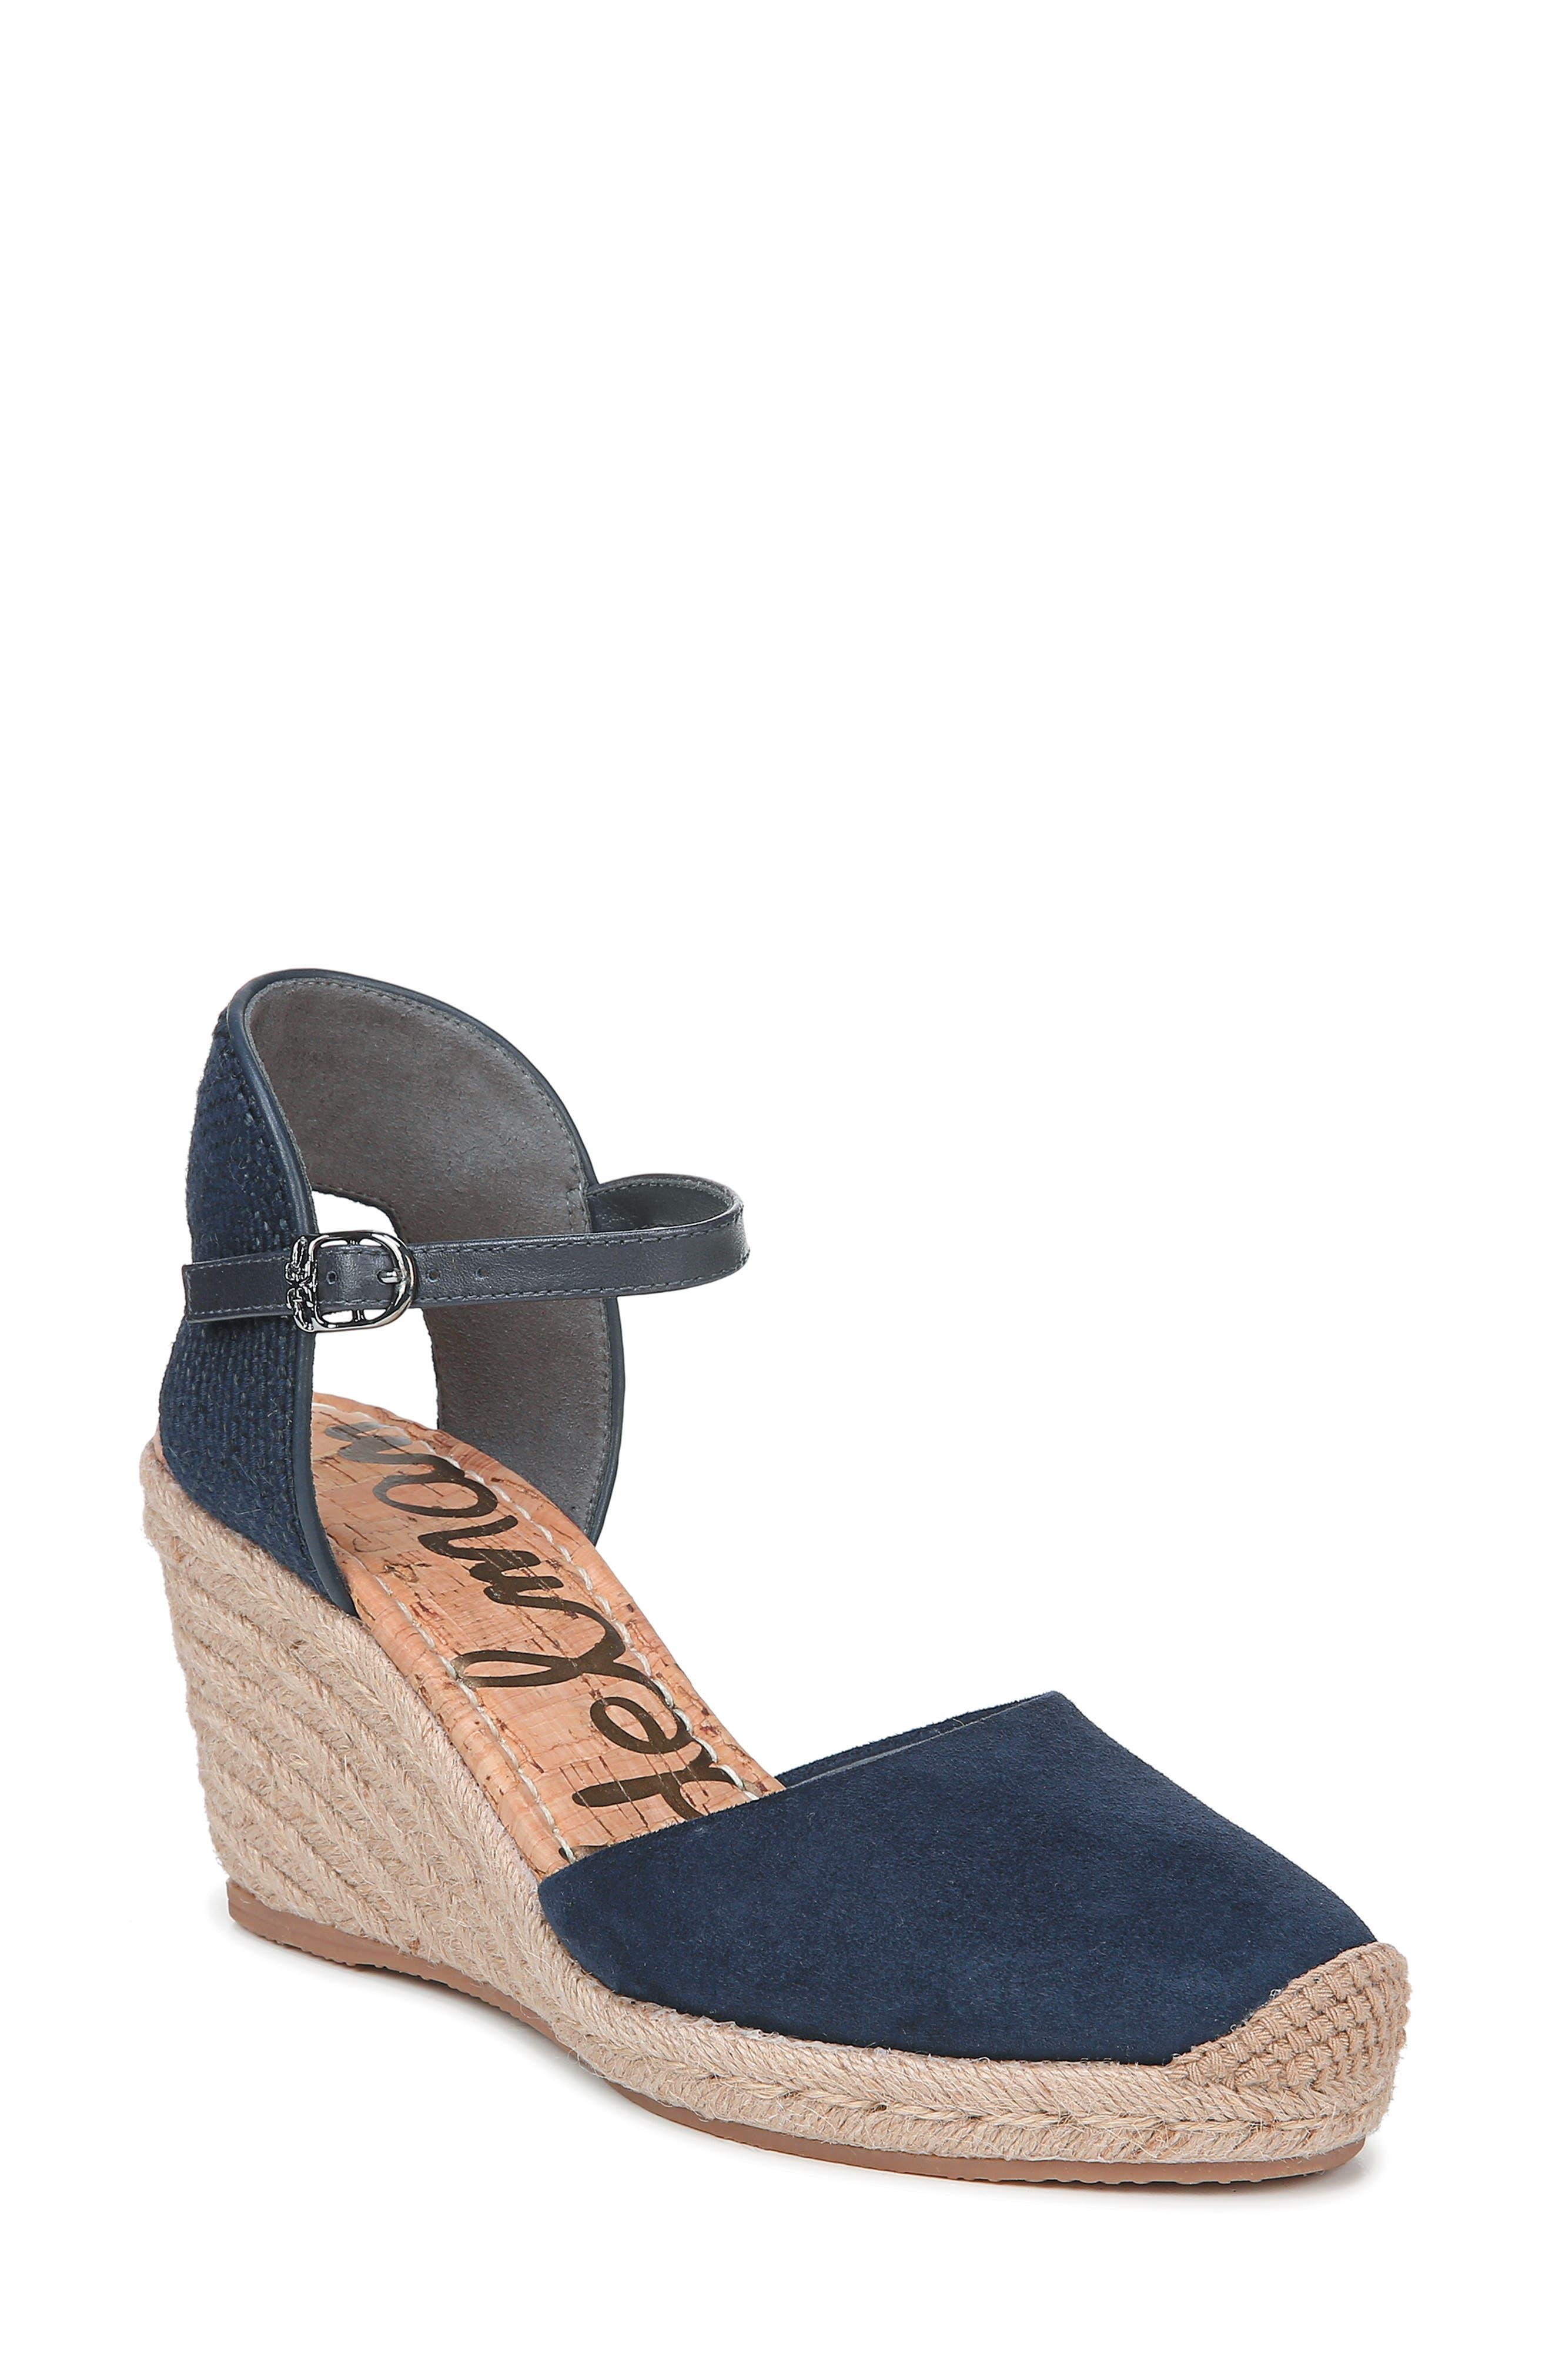 Sam Edelman Payton Wedge Sandal, Blue